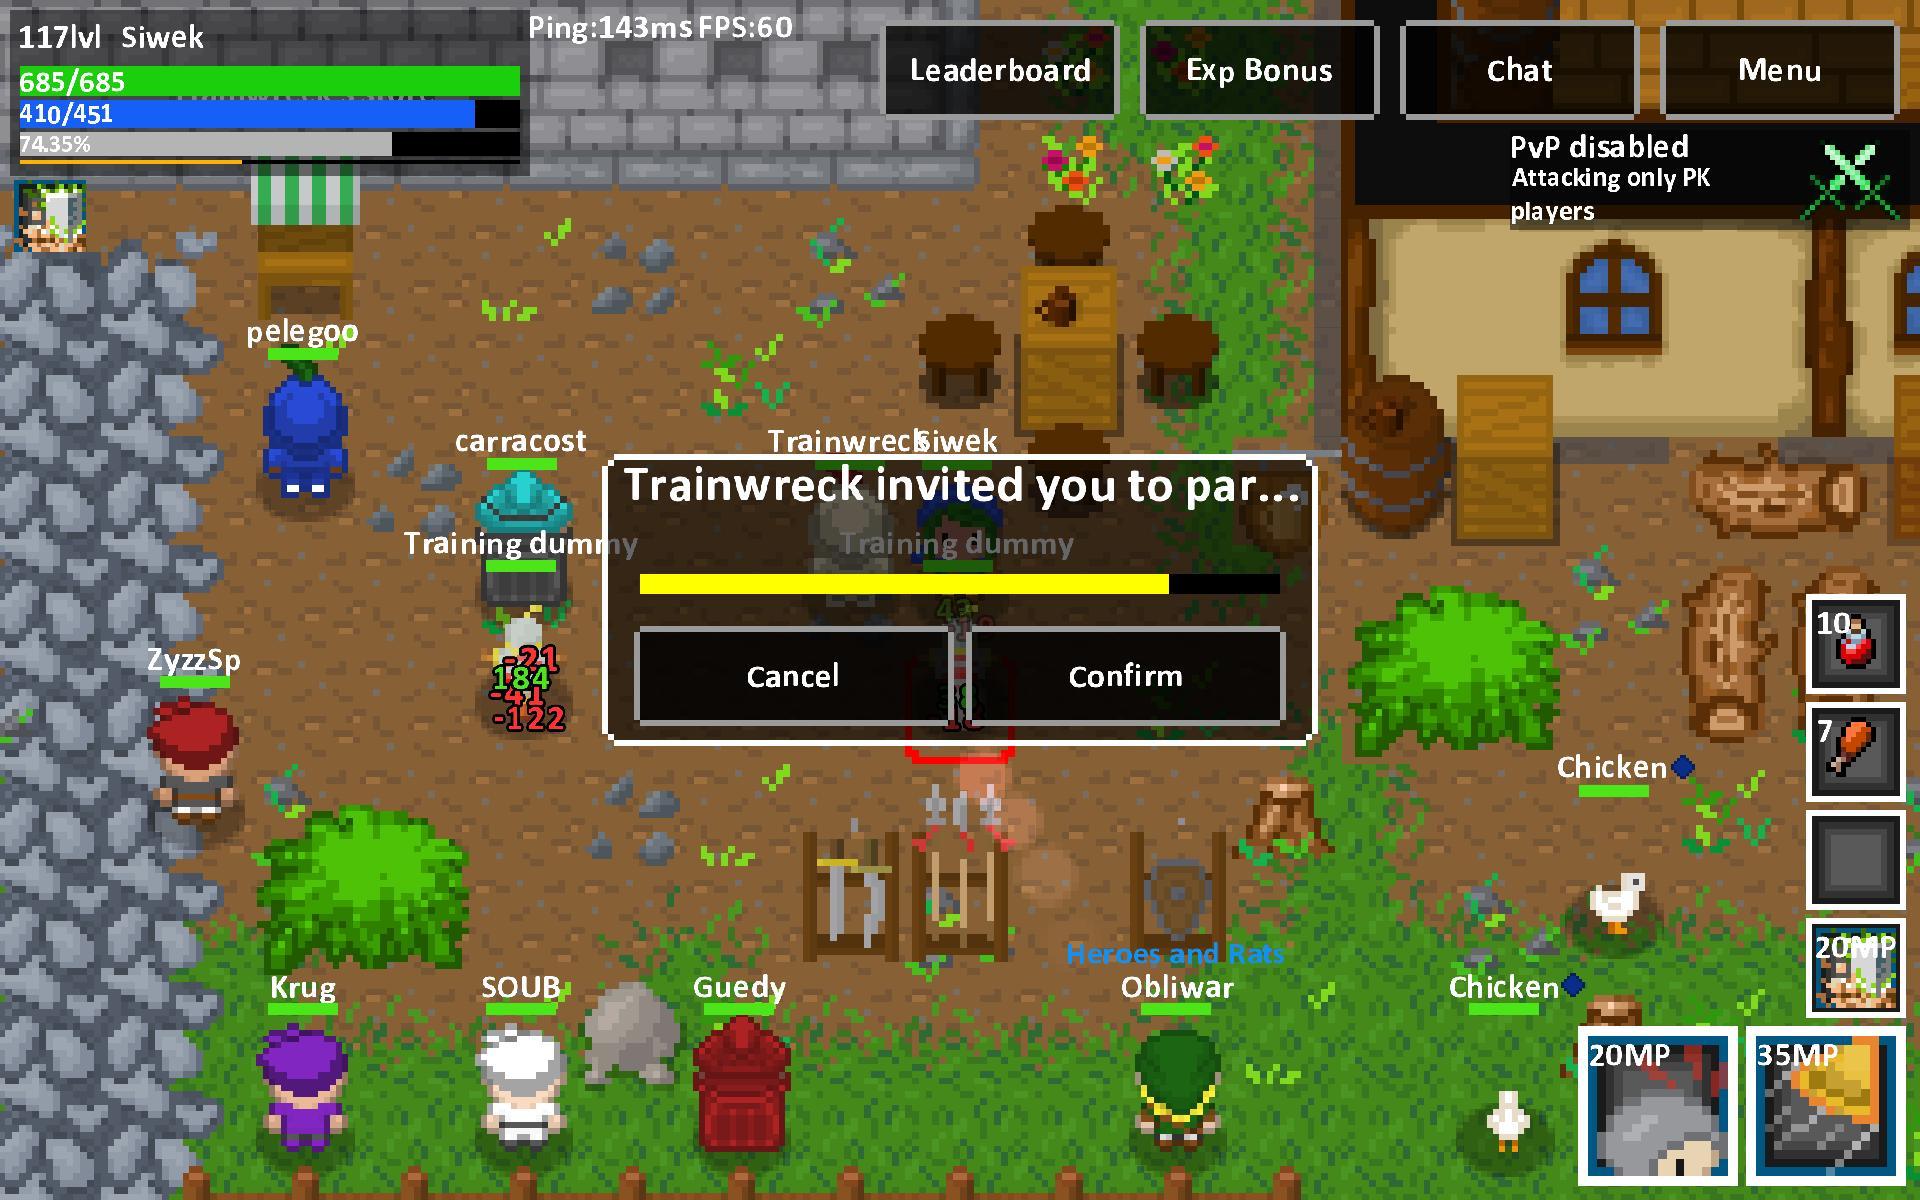 Heroes & Rats MMORPG Online 0.32.2 Screenshot 13